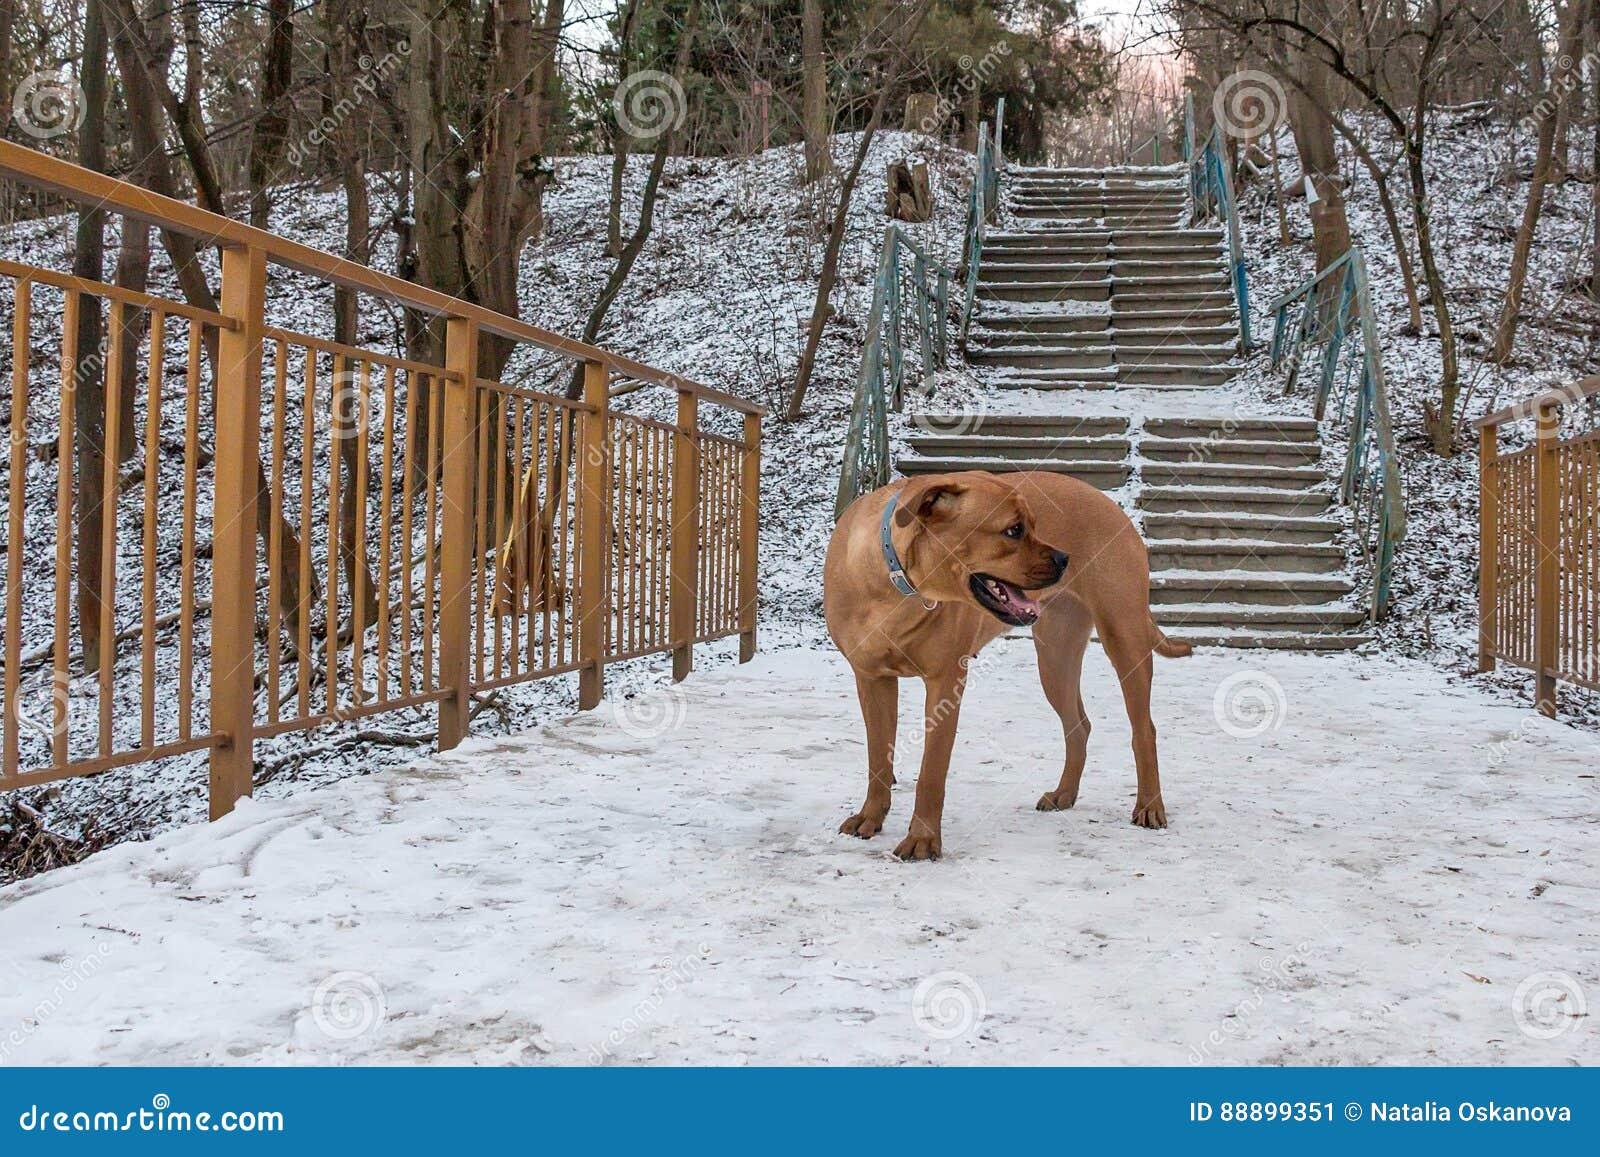 Lost pitiful dog